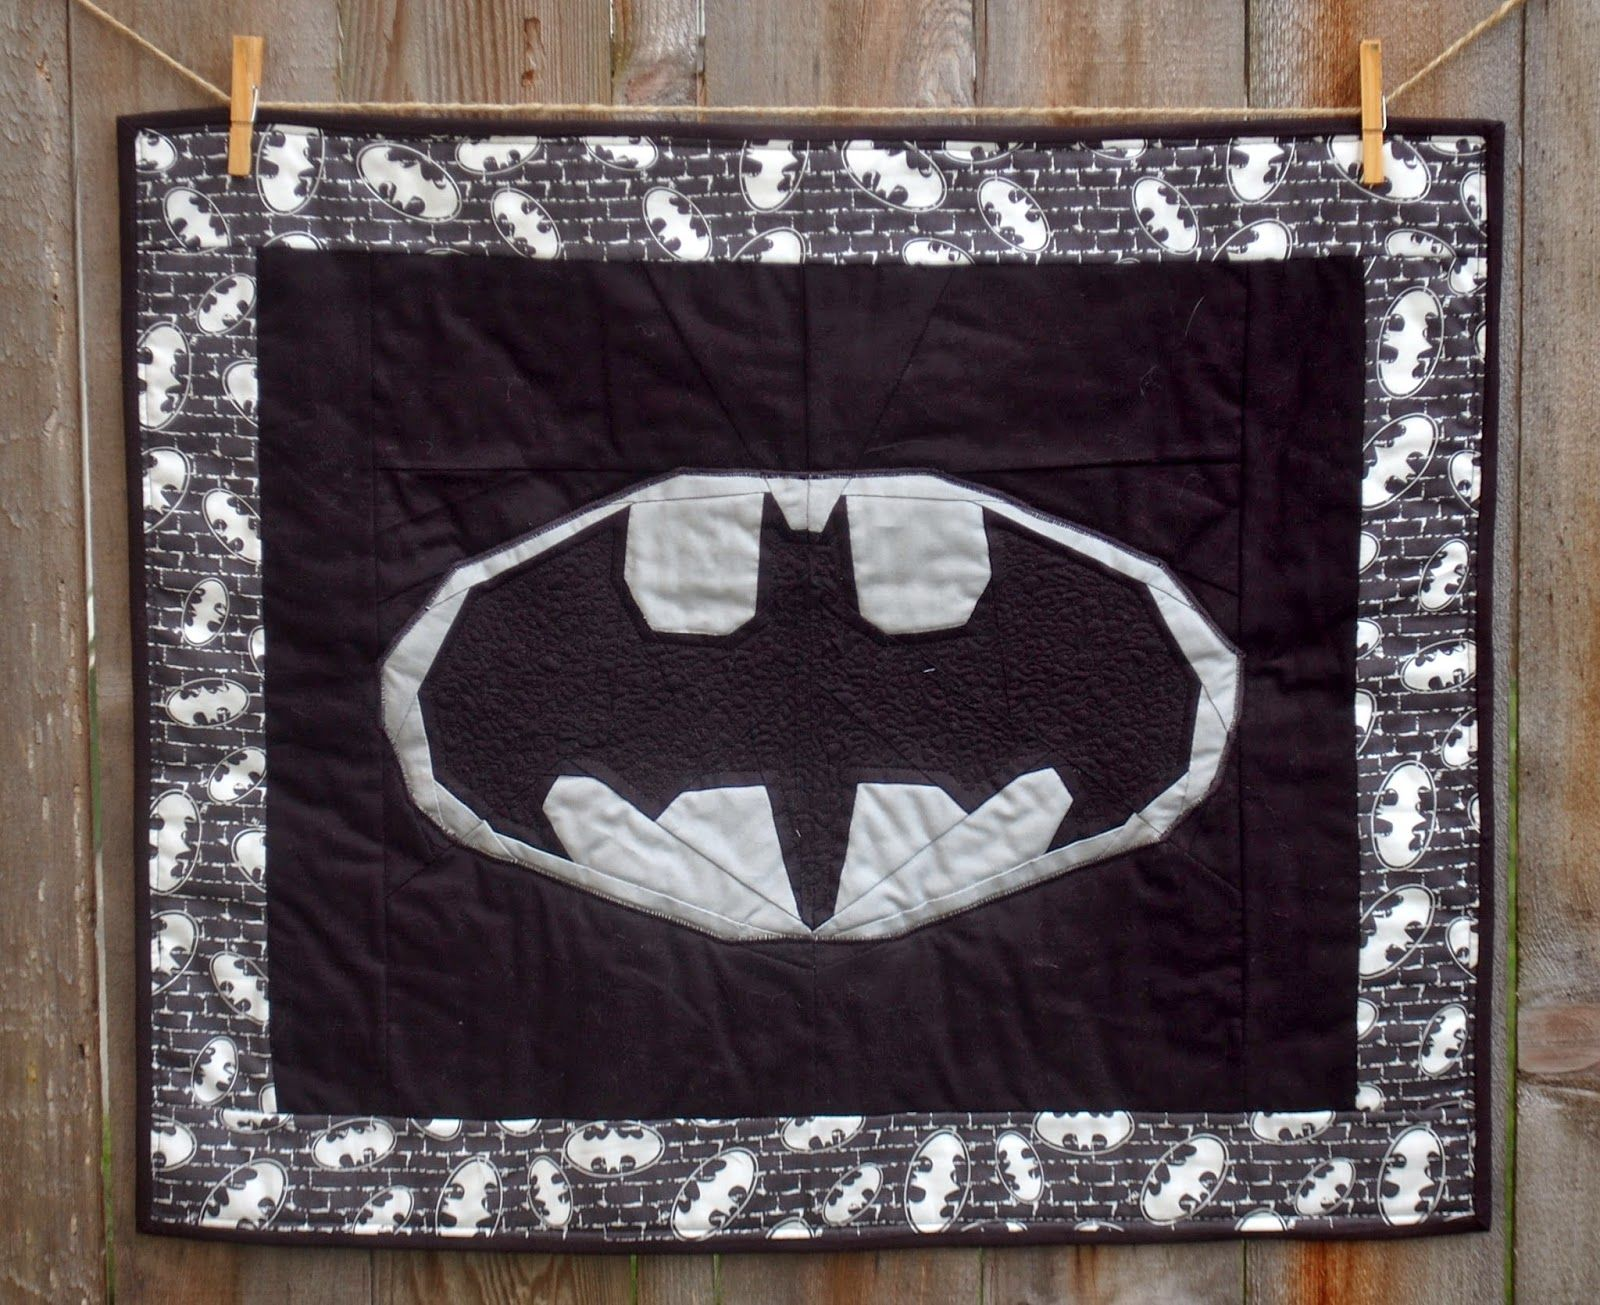 Batman Quilt | Quilting | Pinterest | Batman quilt, Batman and Blanket : batman quilt pattern - Adamdwight.com